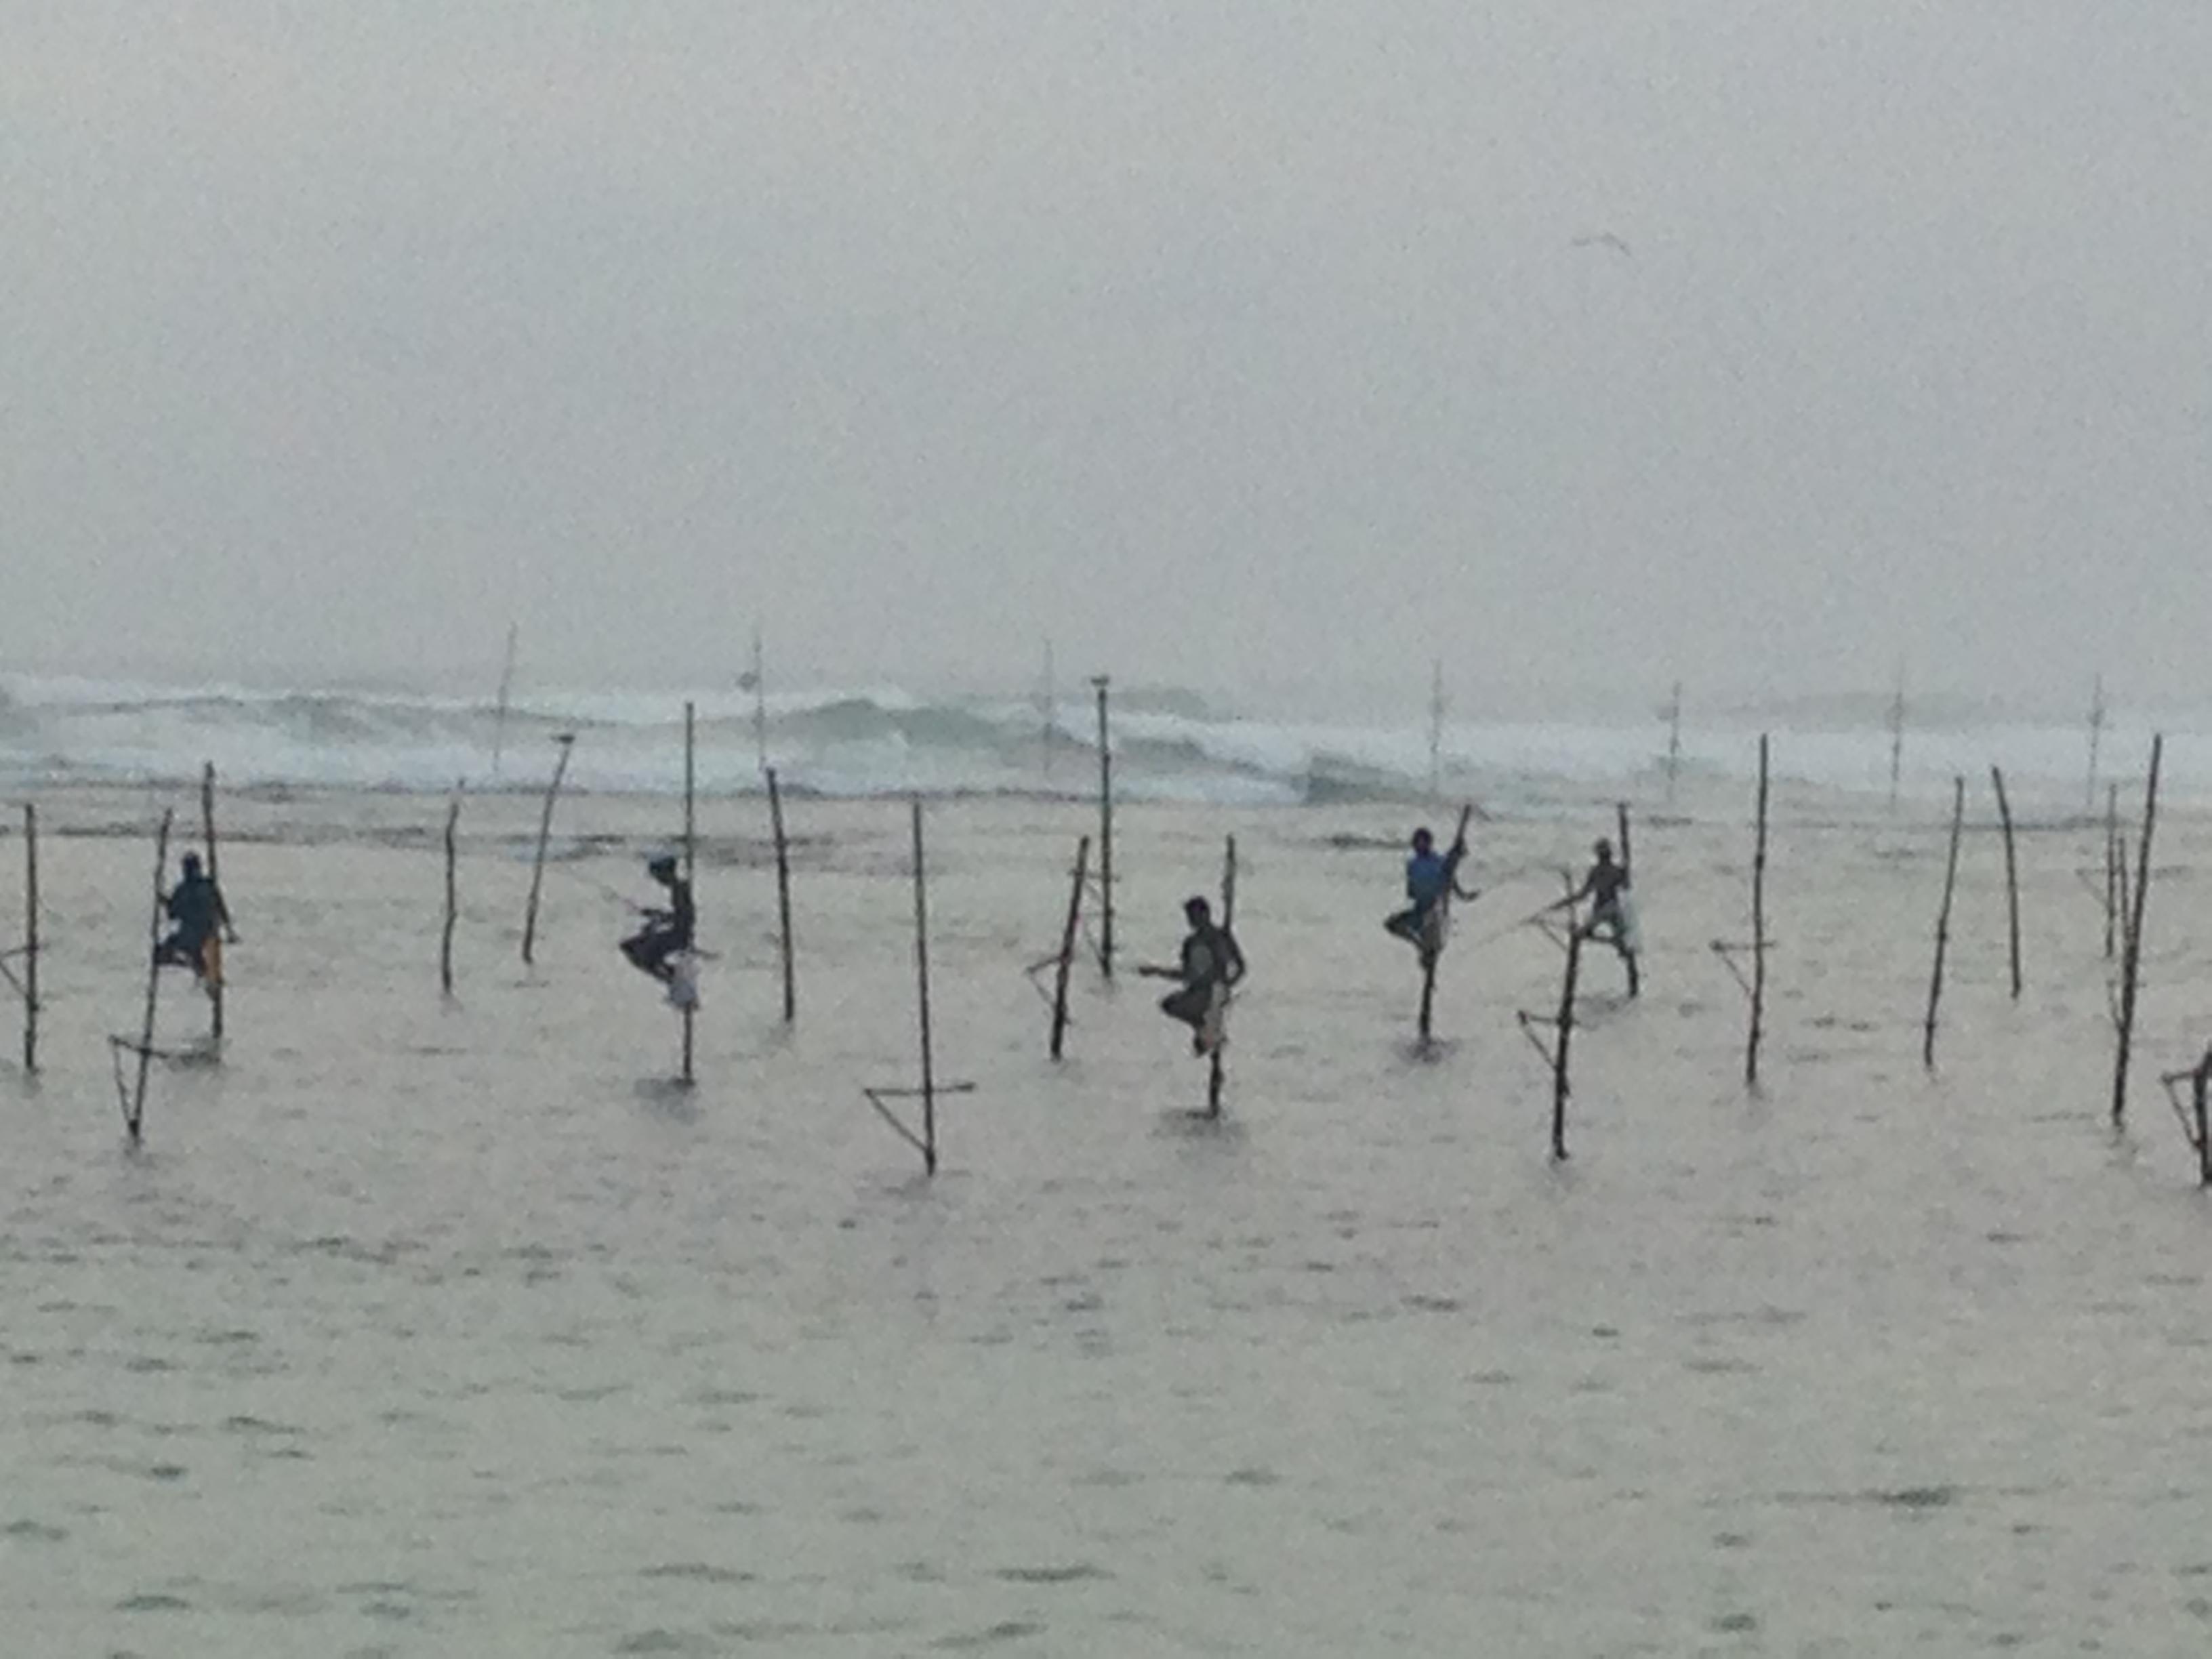 Pecheurs srilankais